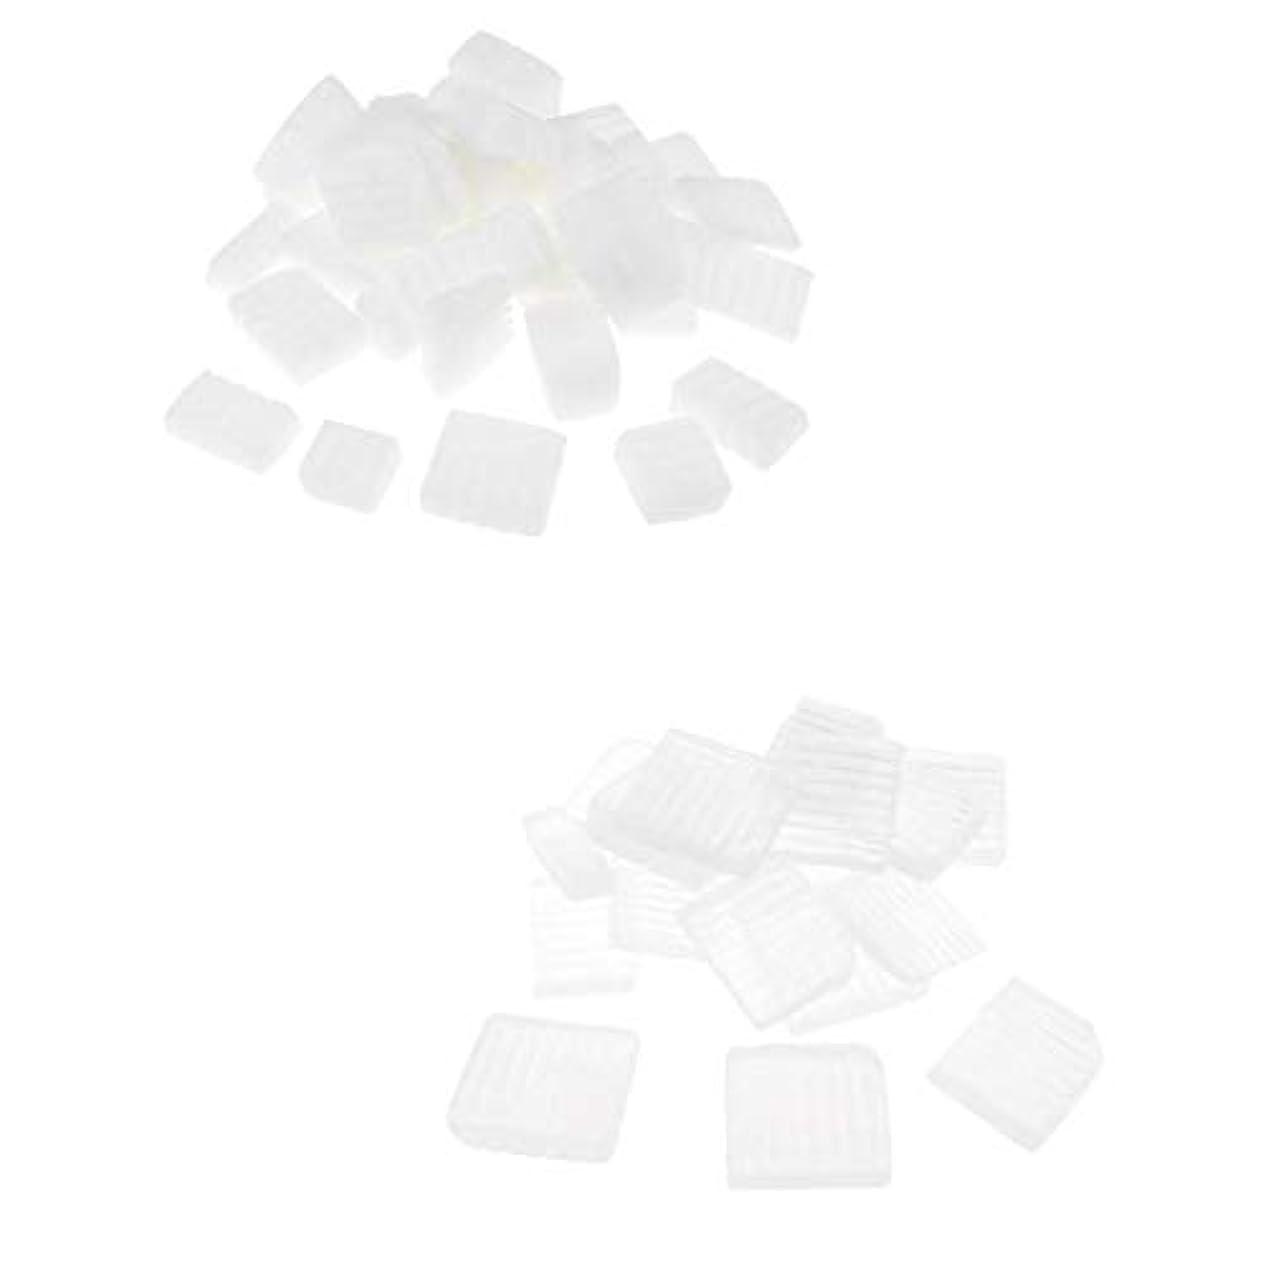 FLAMEER 固形せっけん 石鹸ベース 2KG ホワイトクリア DIY製造 工芸品 ハンドメイド 石鹸原料 耐久性